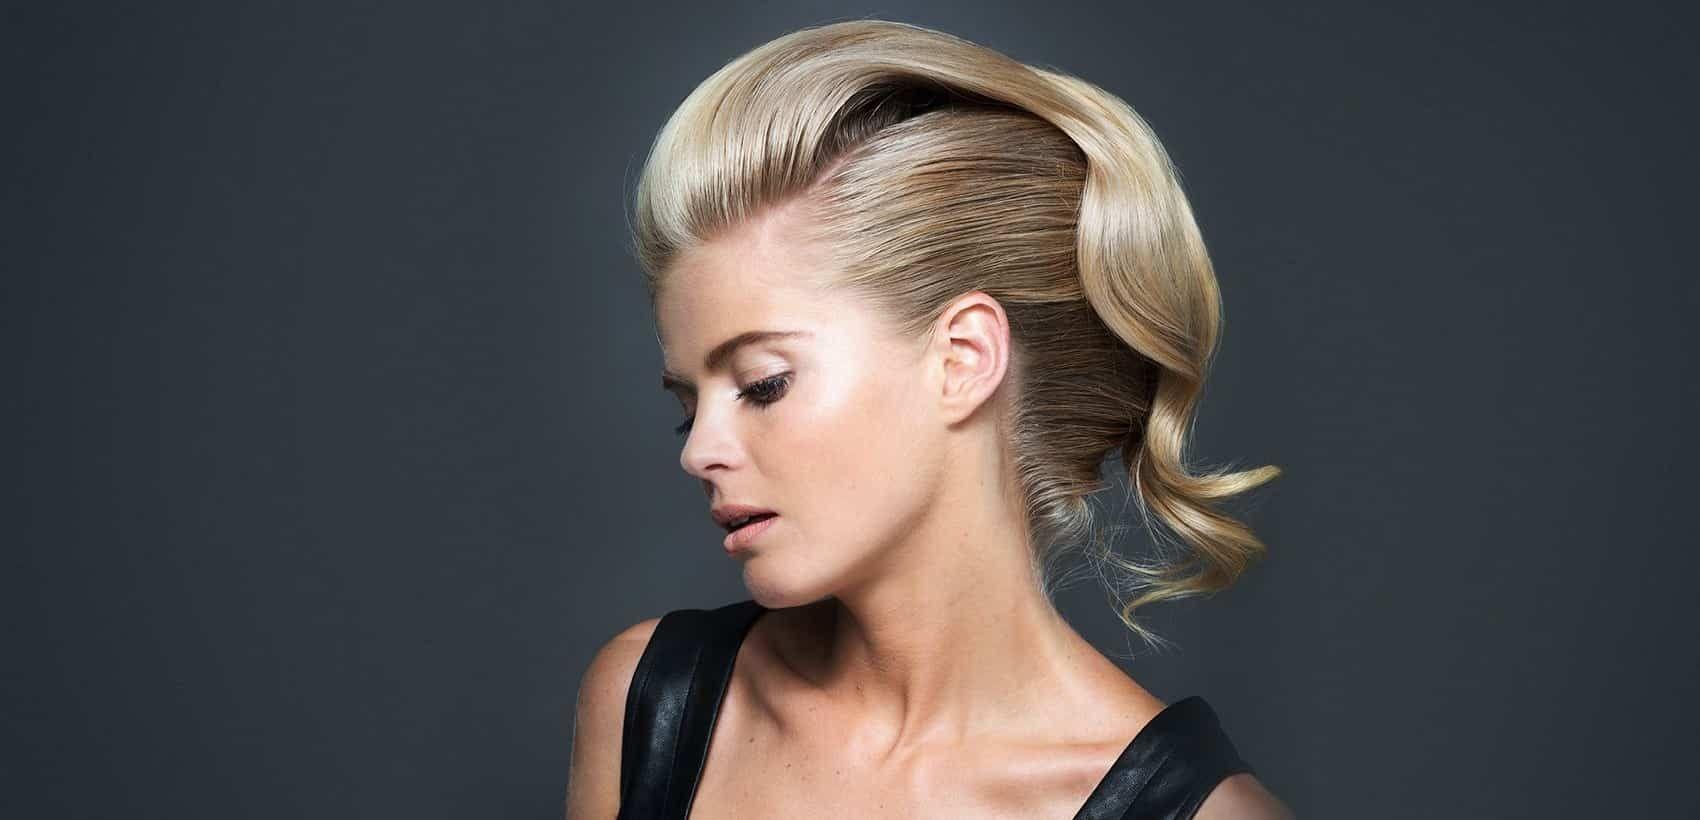 40++ Femme coiffure hair spa des idees